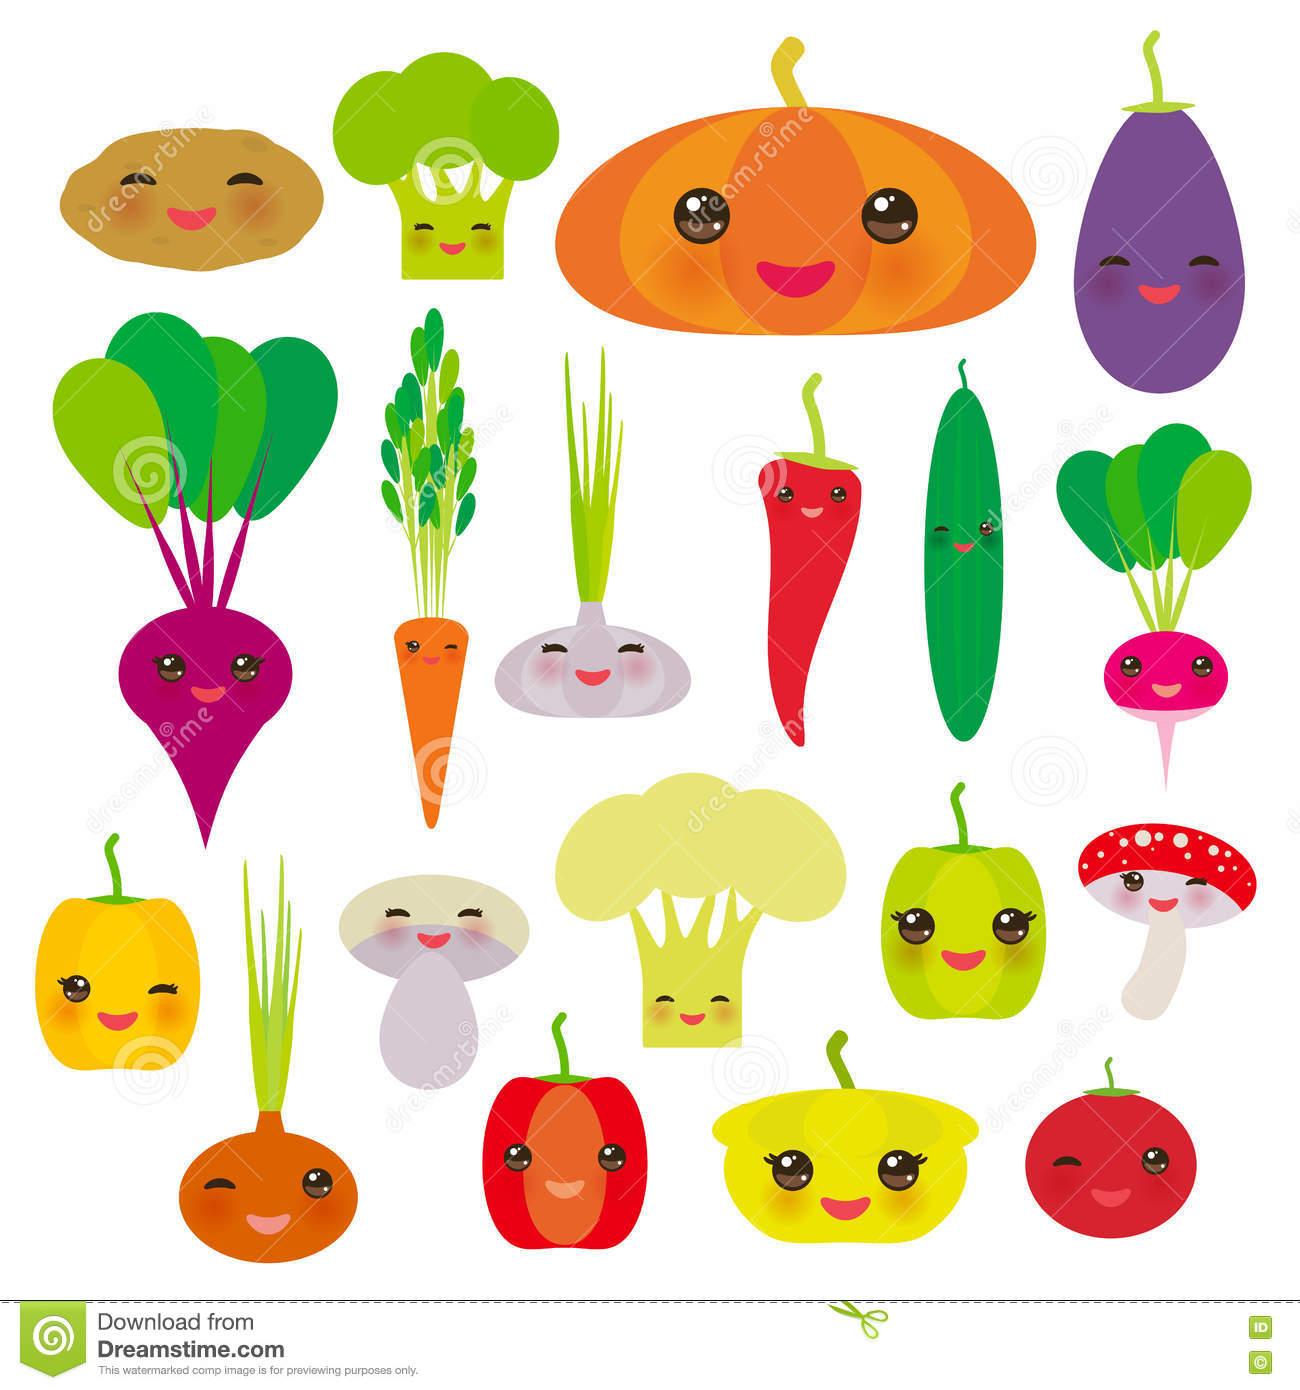 Kawaii Vegetables Bell Peppers, Pumpkin Beets Carrots, Eggplant.